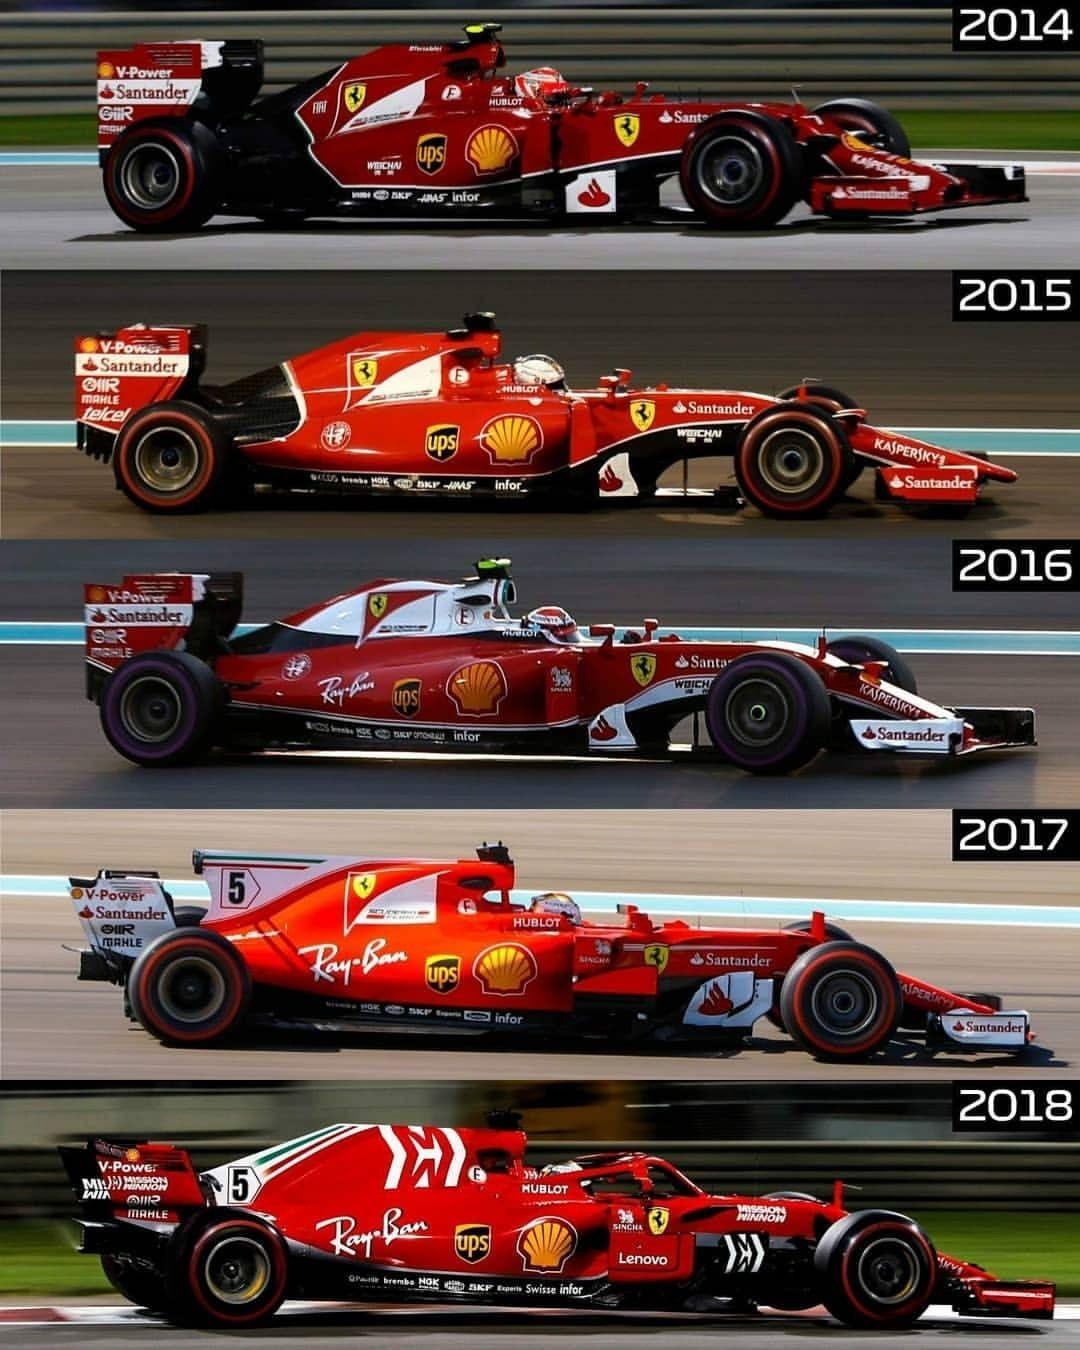 Pin By Shaun Abela On F1 Formula 1 Ferrari Formula 1 Car